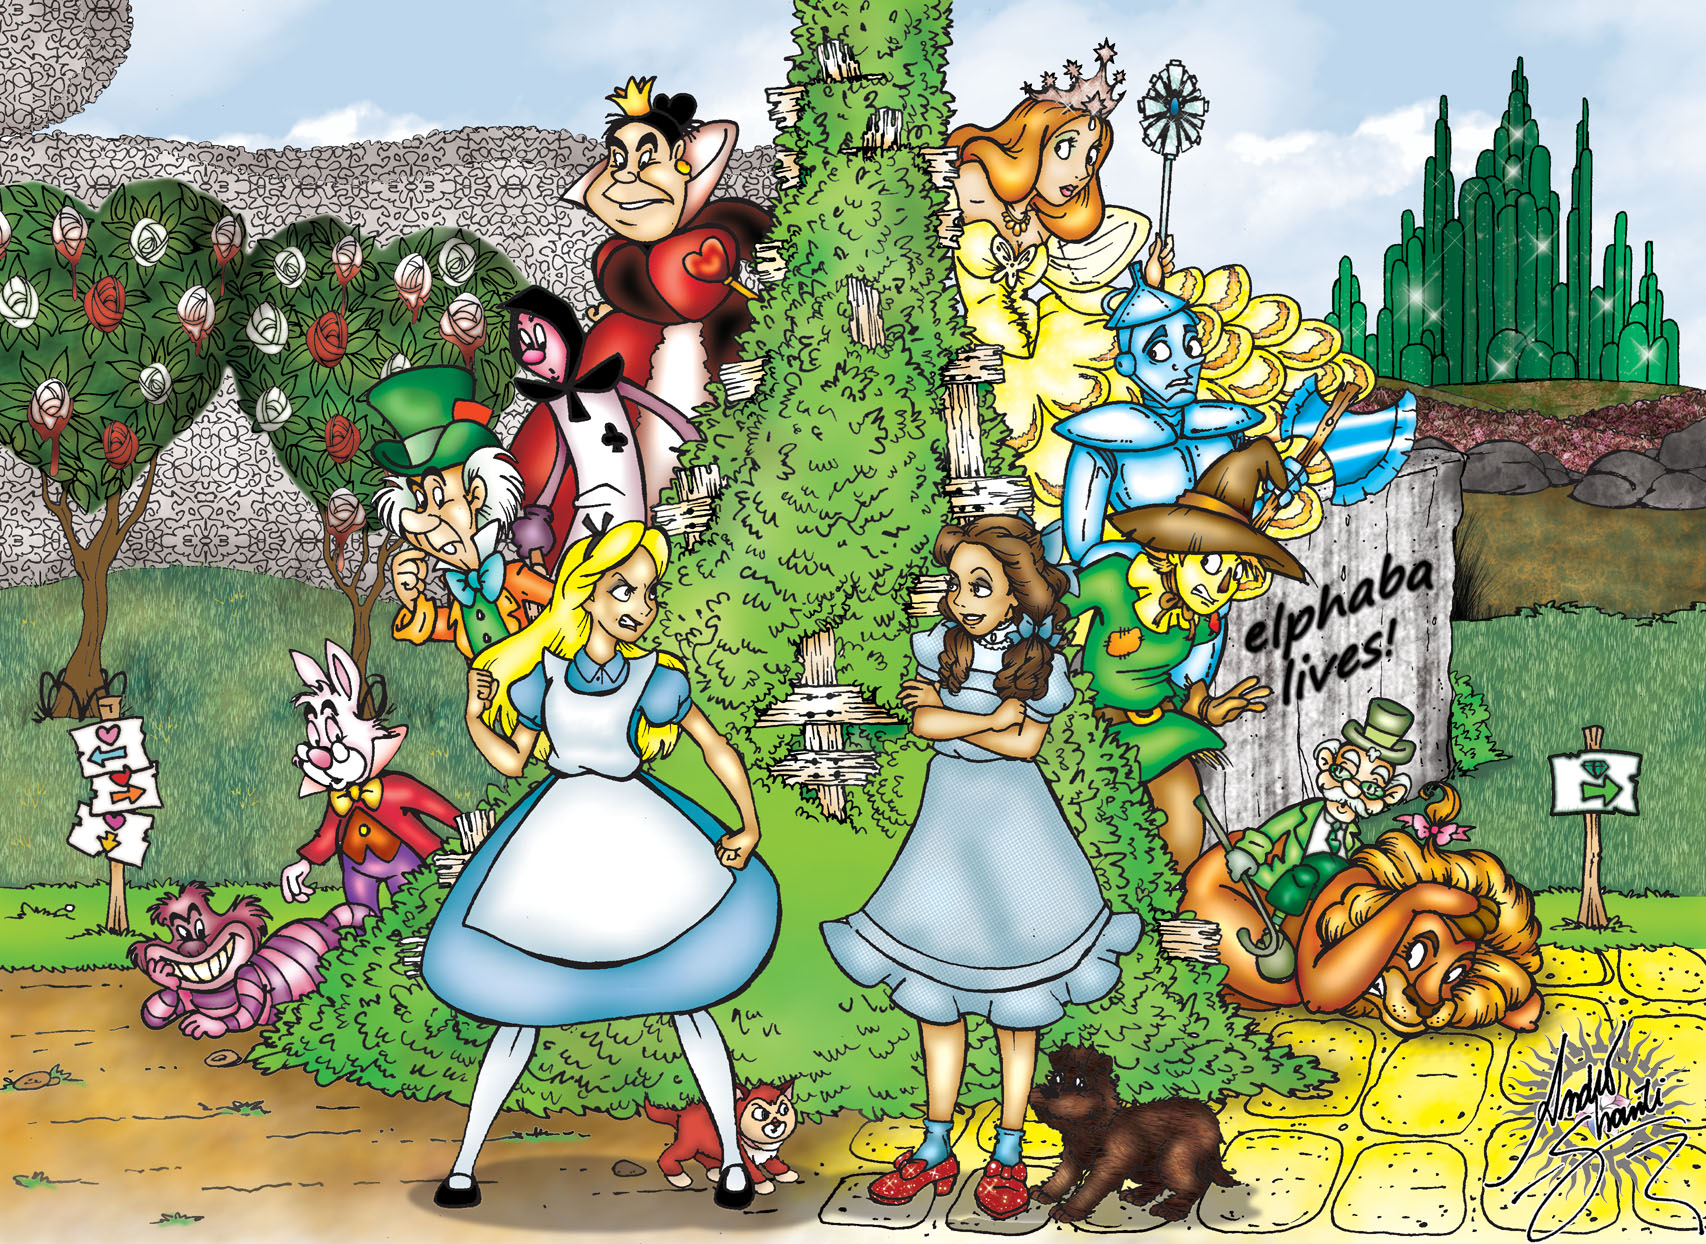 Le Monde Fantastique d'Oz [Disney - 2013] - Page 11 Alice_versus_dorothy_by_andreshanti-d37395u